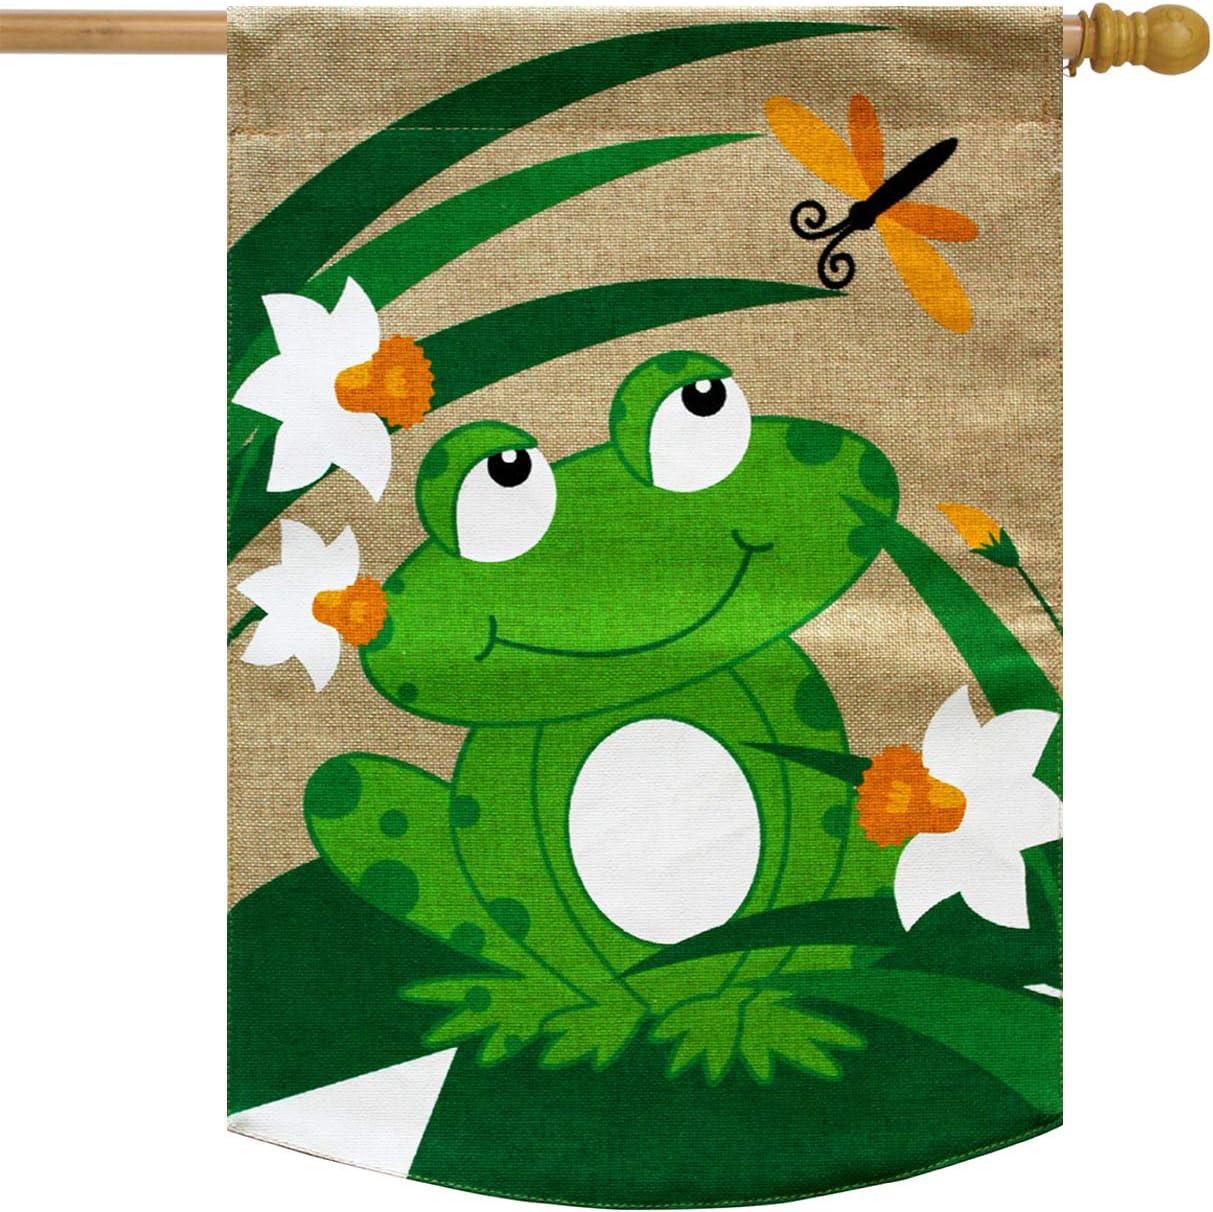 Briarwood Lane Happy Frog Burlap Summer House Flag 28 X 40 Garden Outdoor